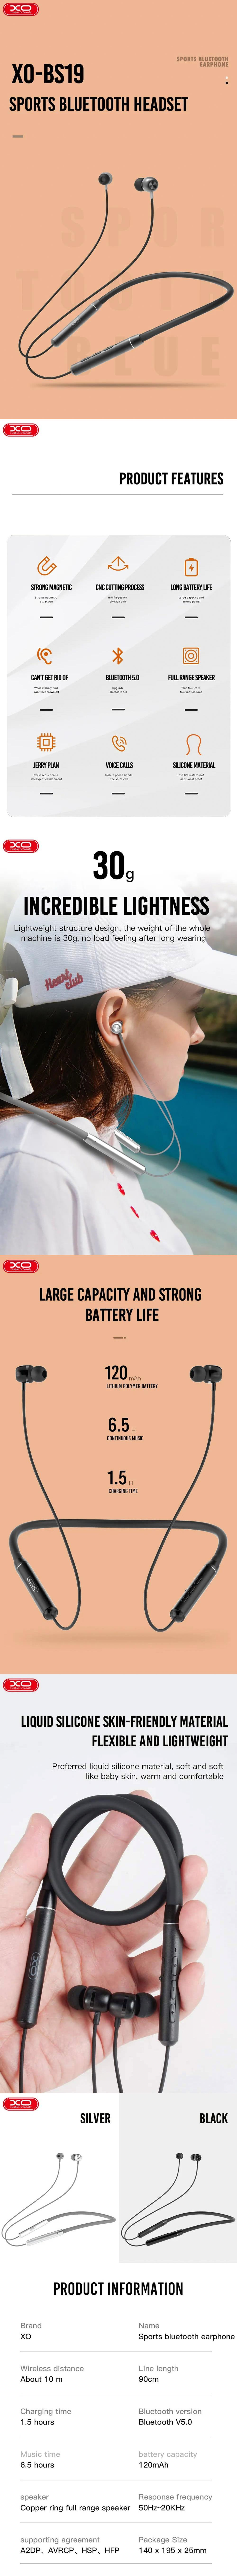 XO Bluetooth earphones BS19 black